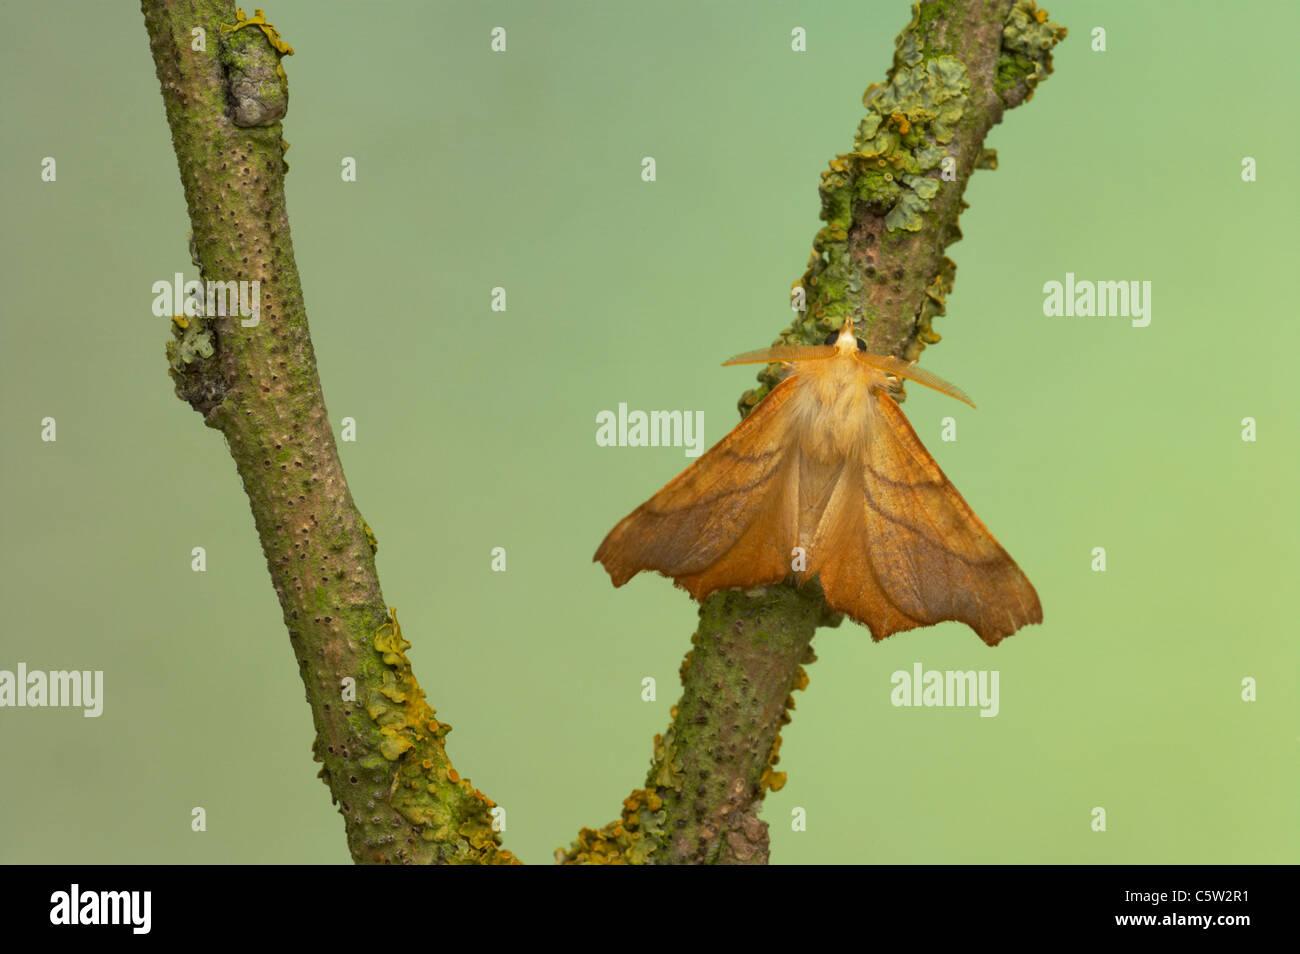 Dusky Thorn Ennomos fuscantaria Essex, UK IN000426 - Stock Image